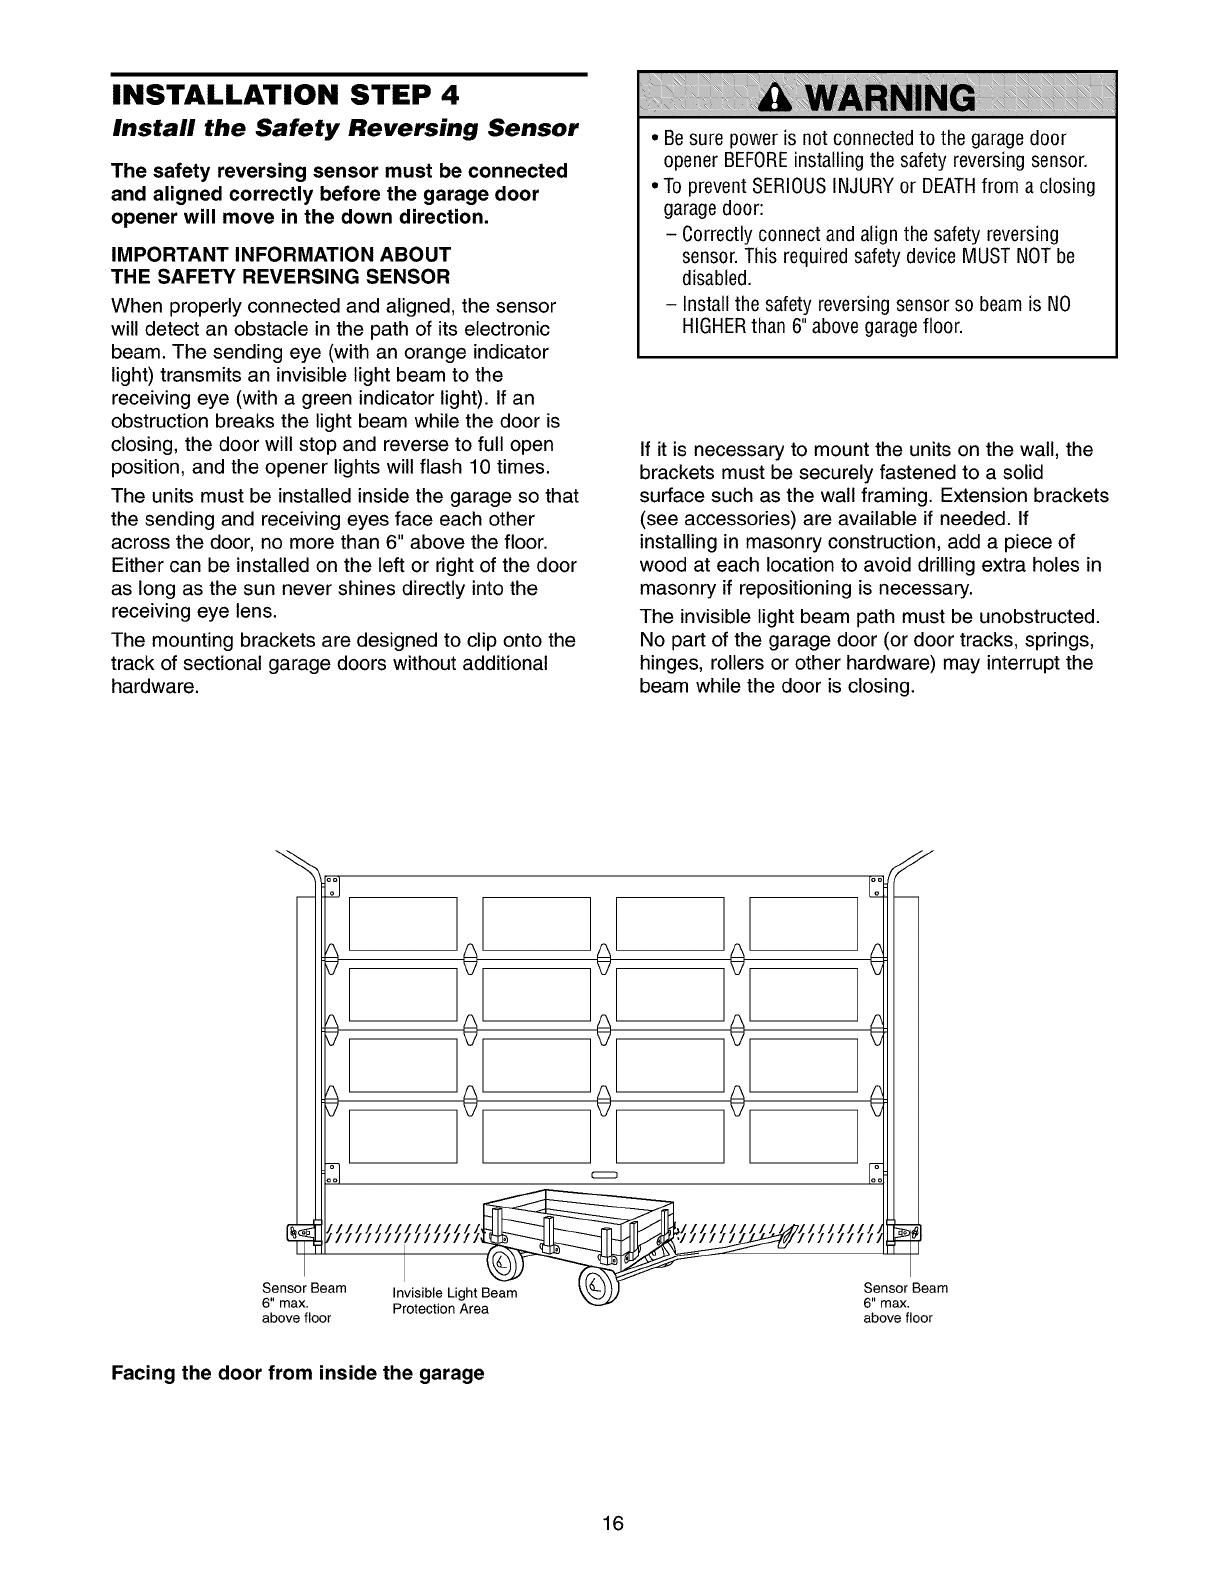 Craftsman 13953991 User Manual Garage Door Opener Manuals And Guides Safety Reversing Sensor Wiring Diagram Installation Step 4 Install The